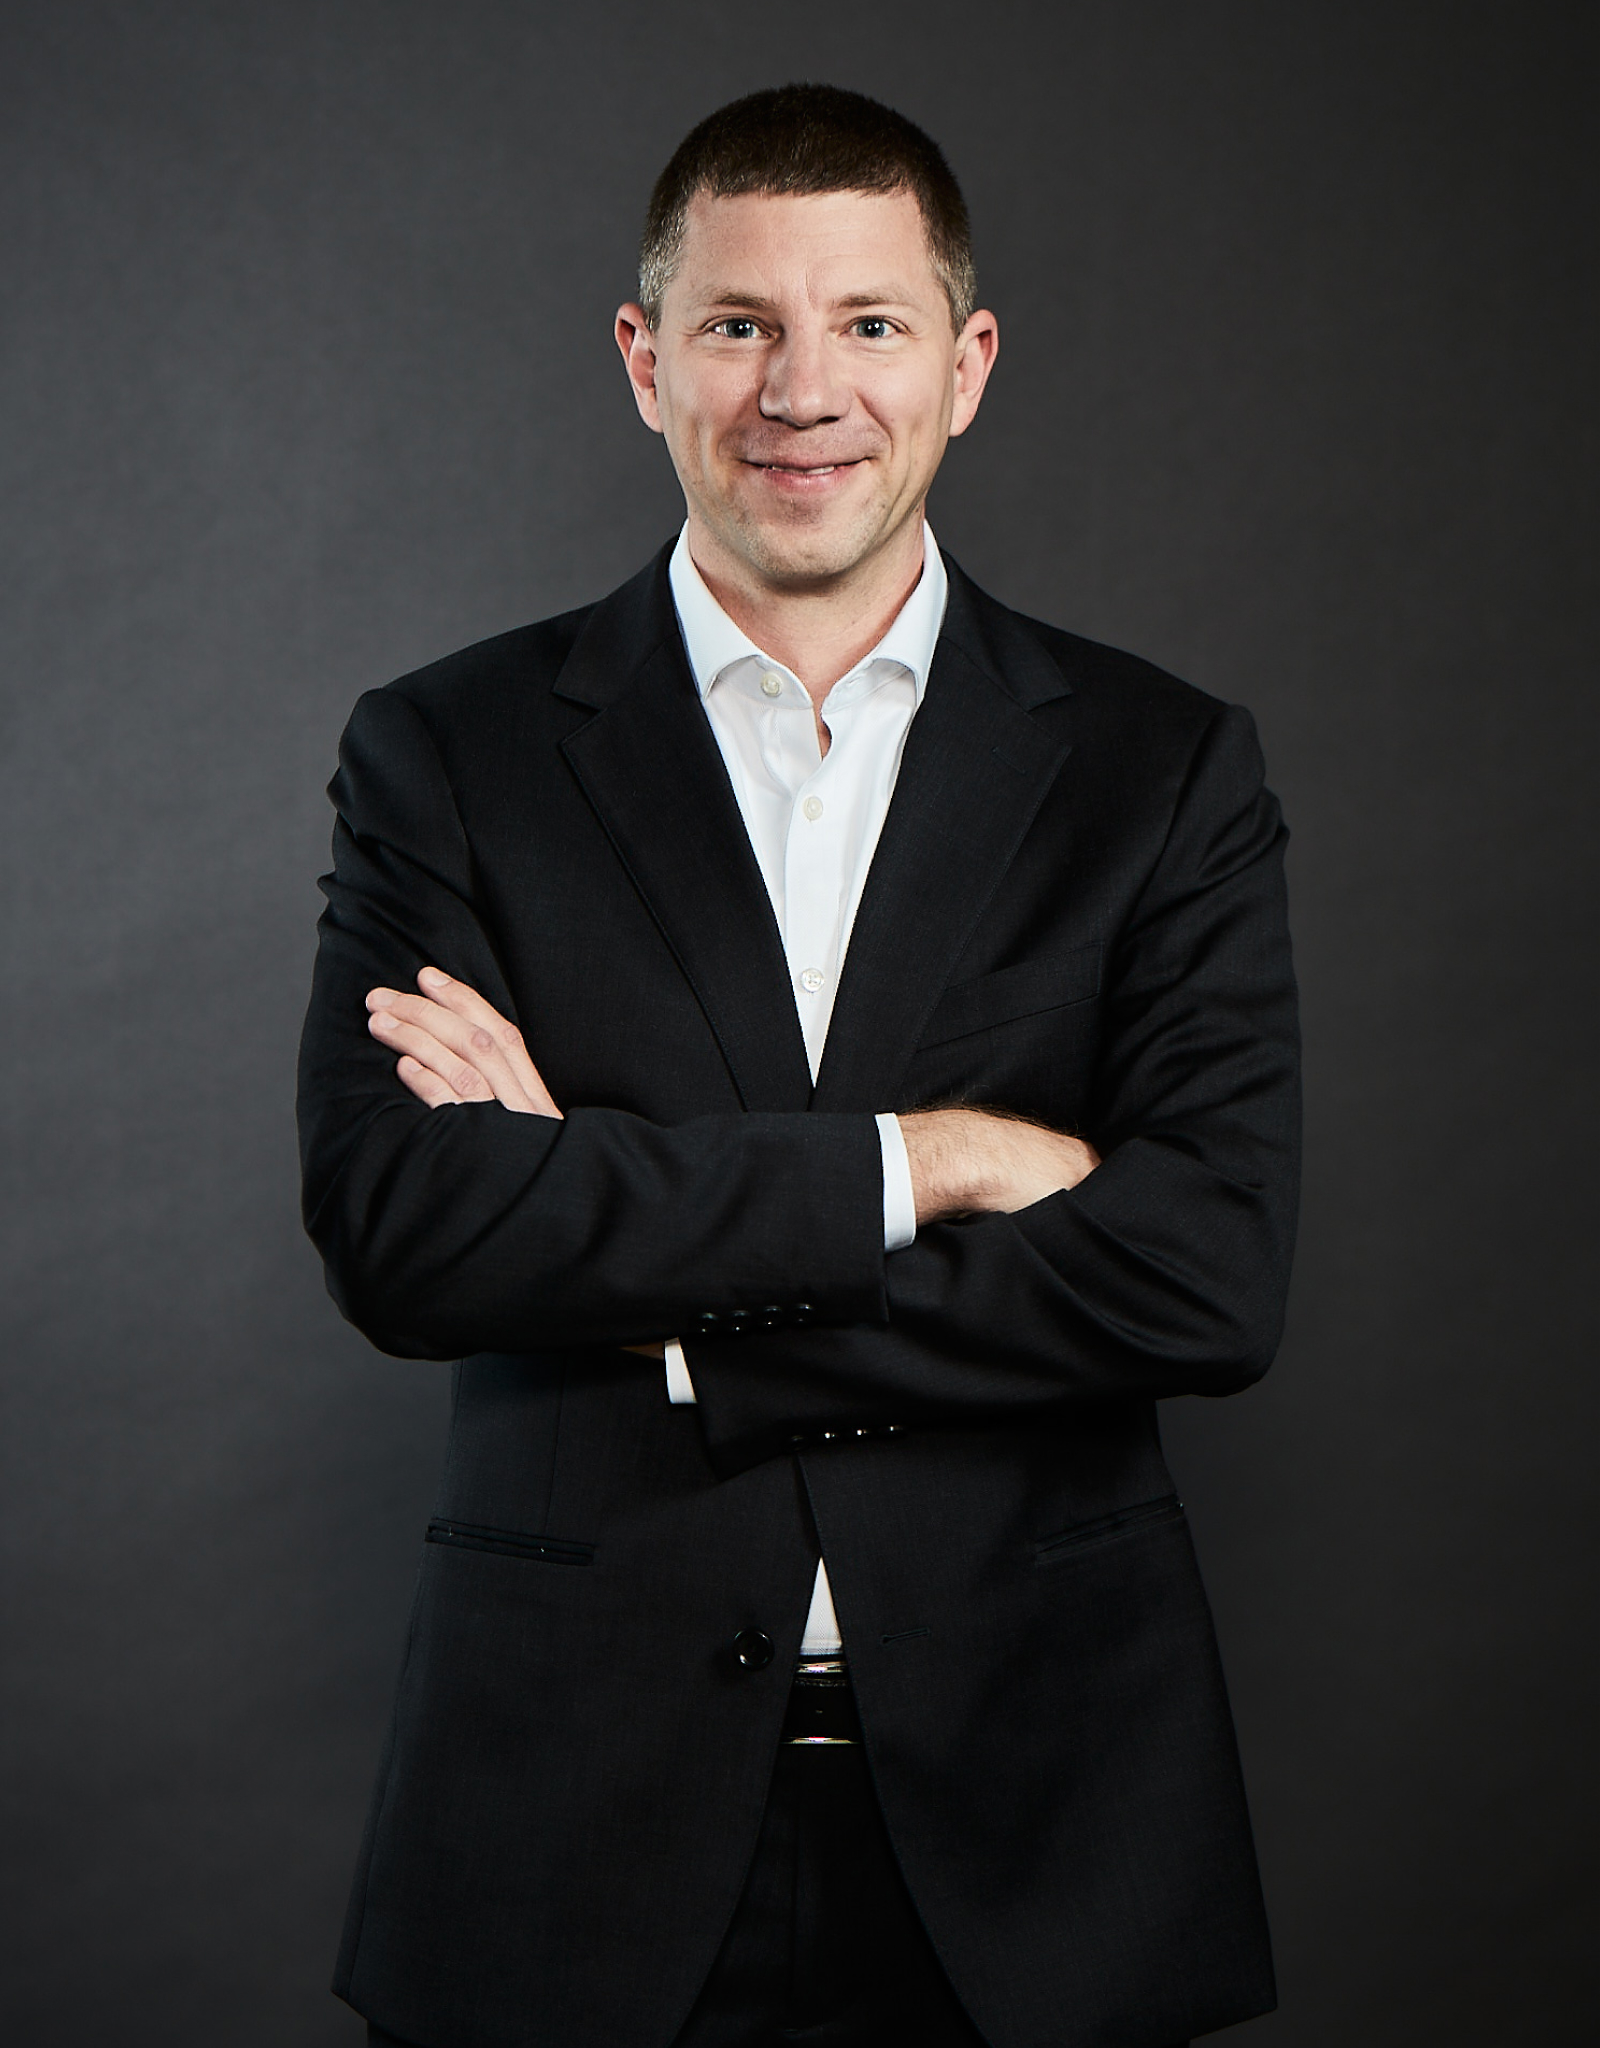 Chris Lubbring